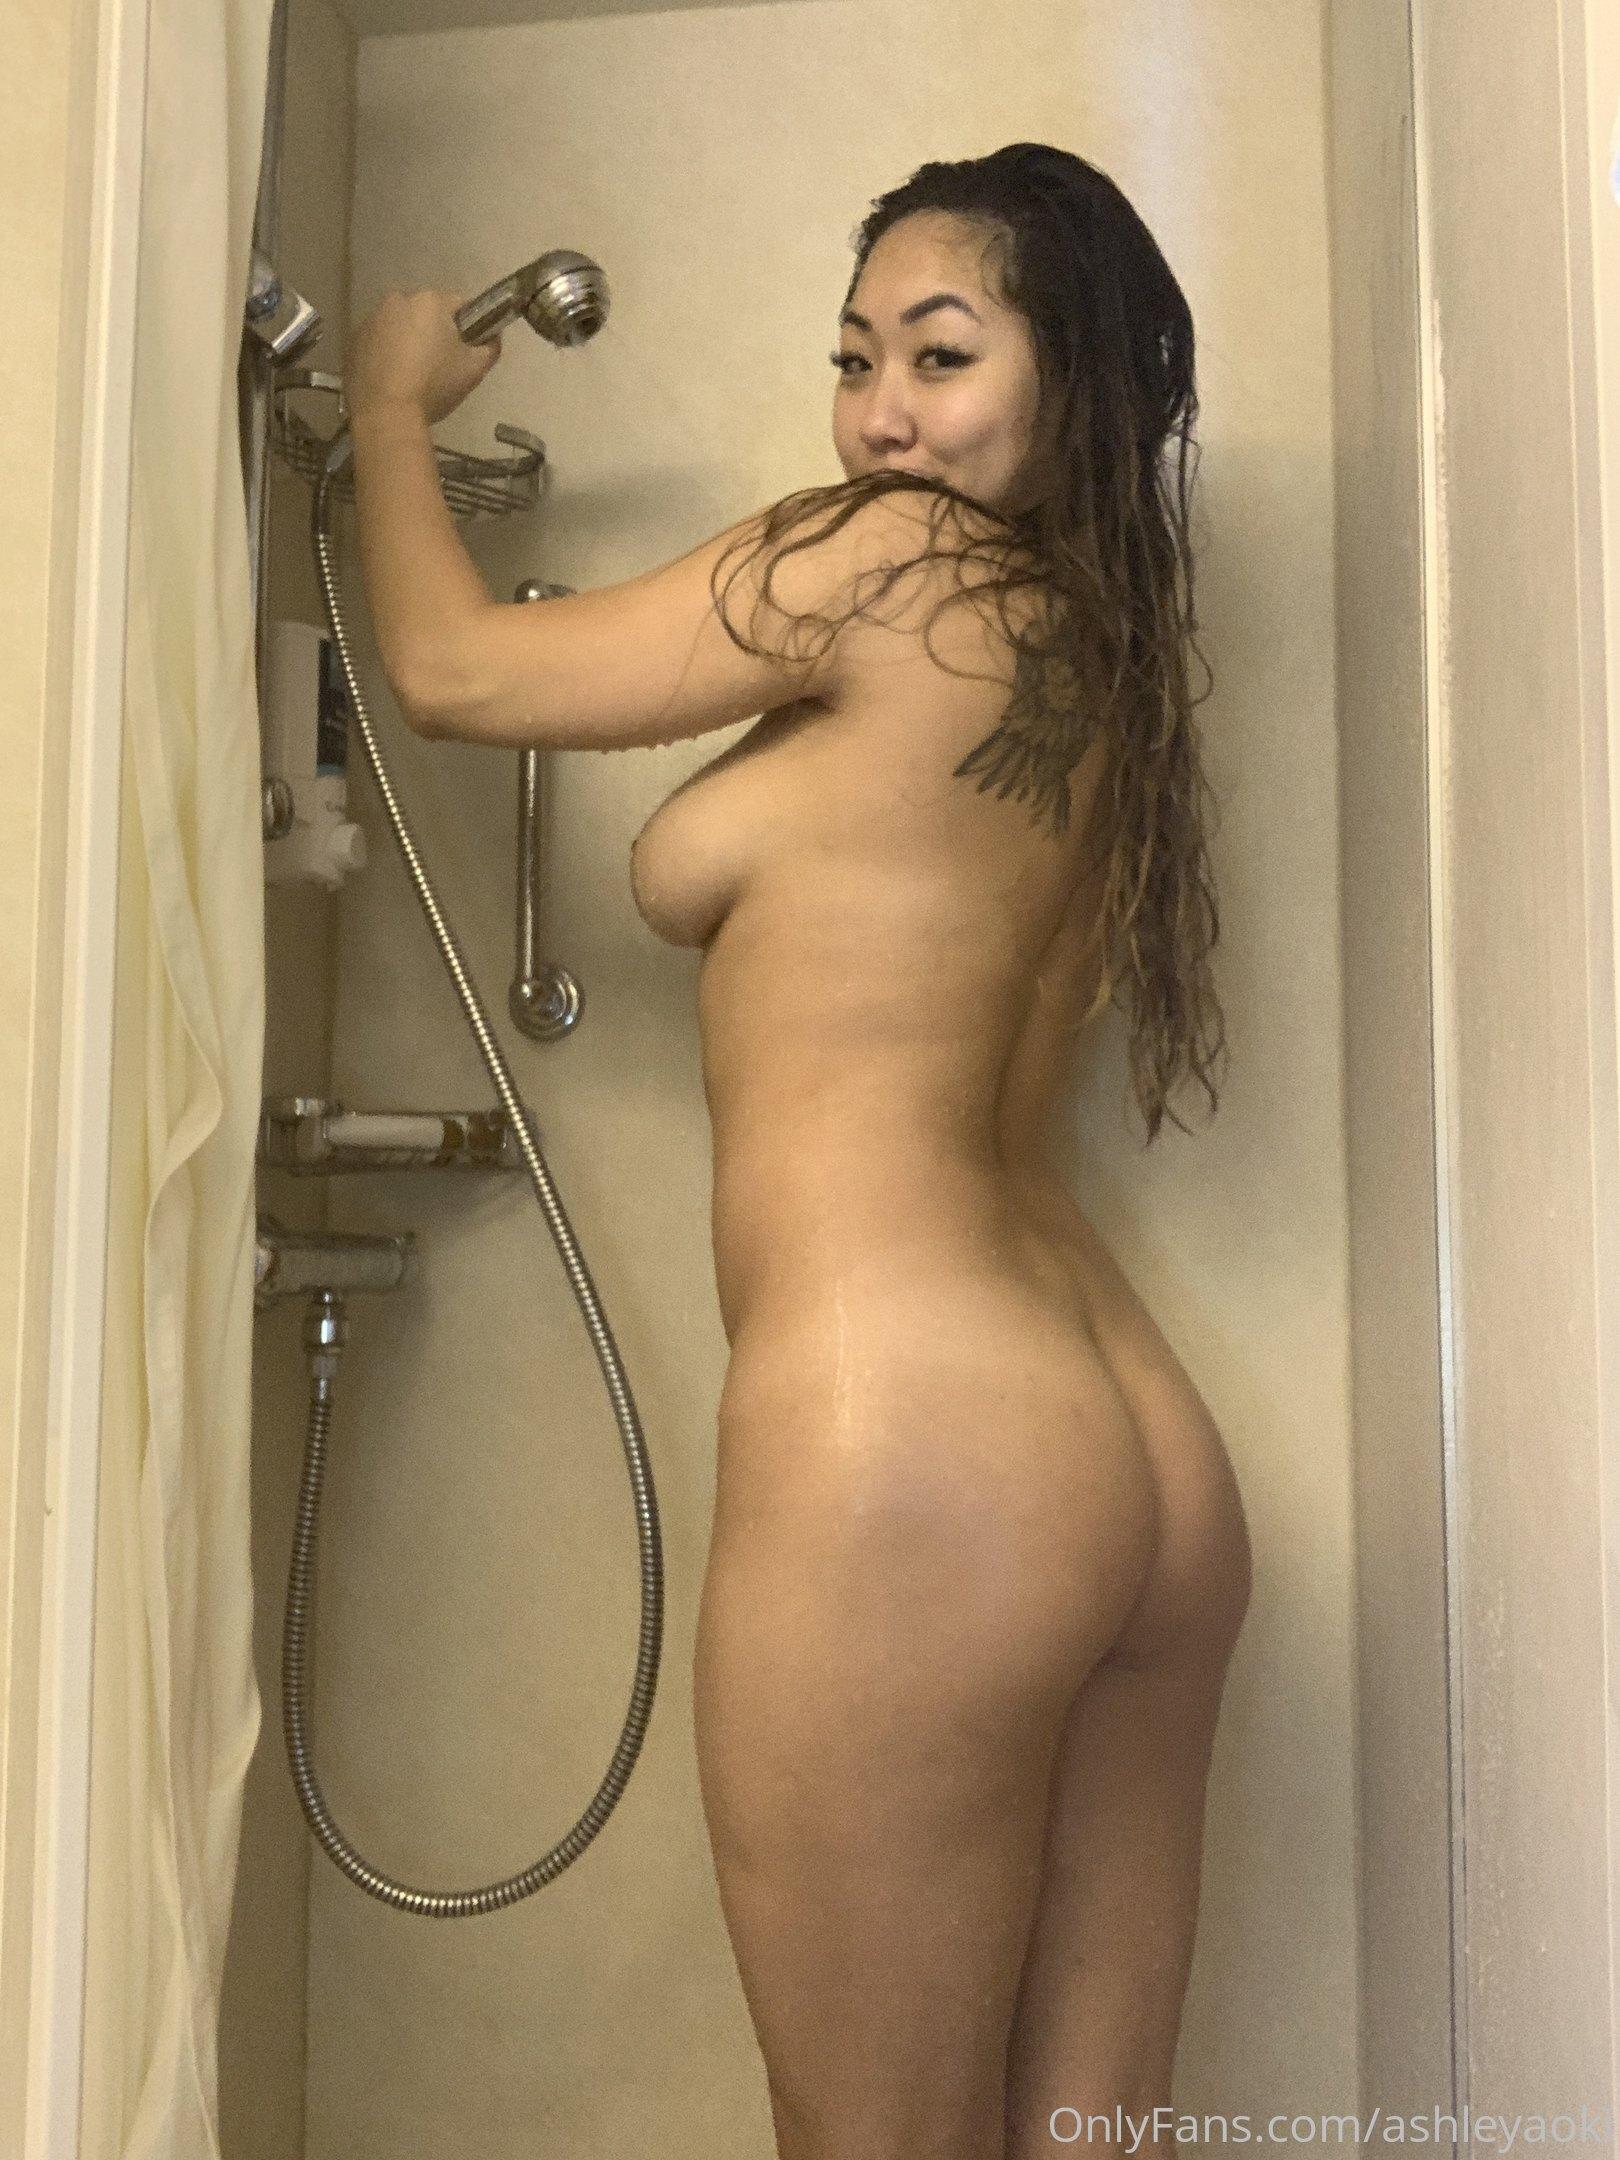 Ashley Aoki, Ashleyaoki, Onlyfans Leaks 0229